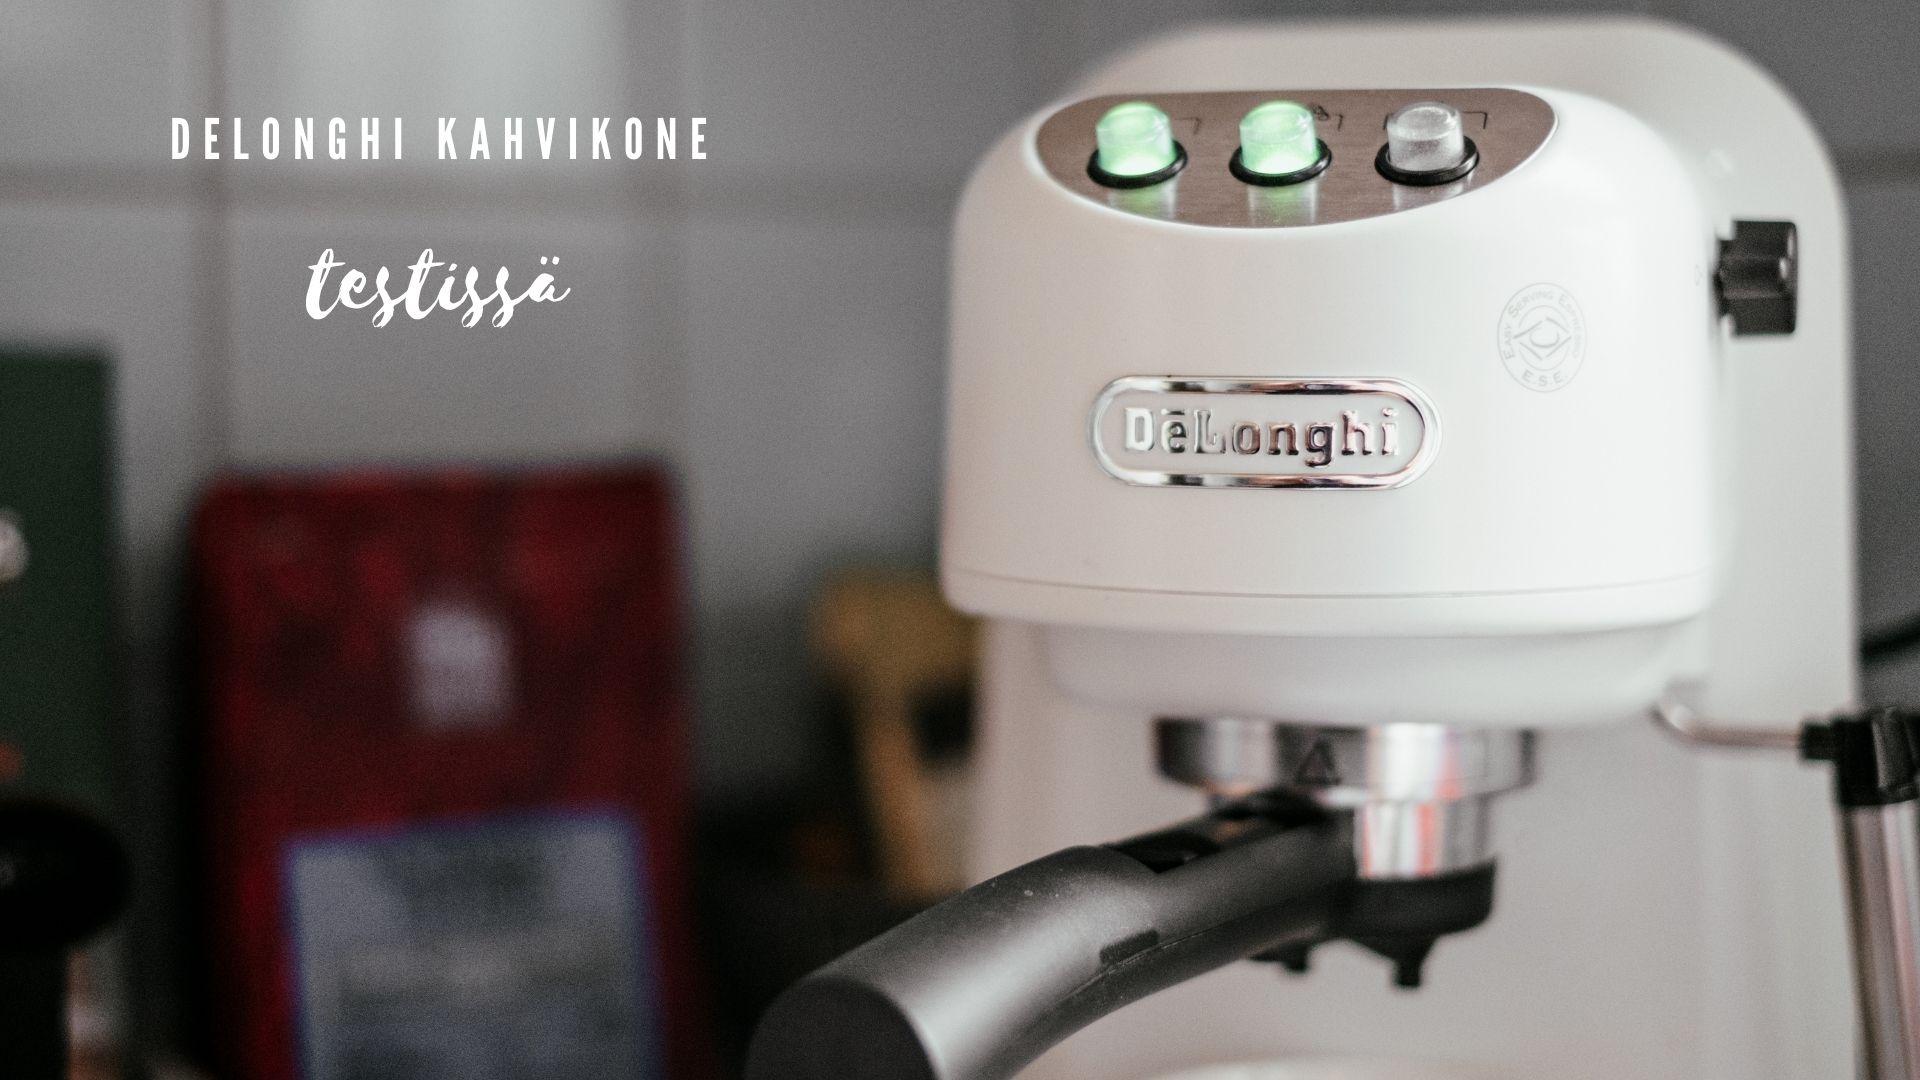 Testissä DeLonghi kahvikone